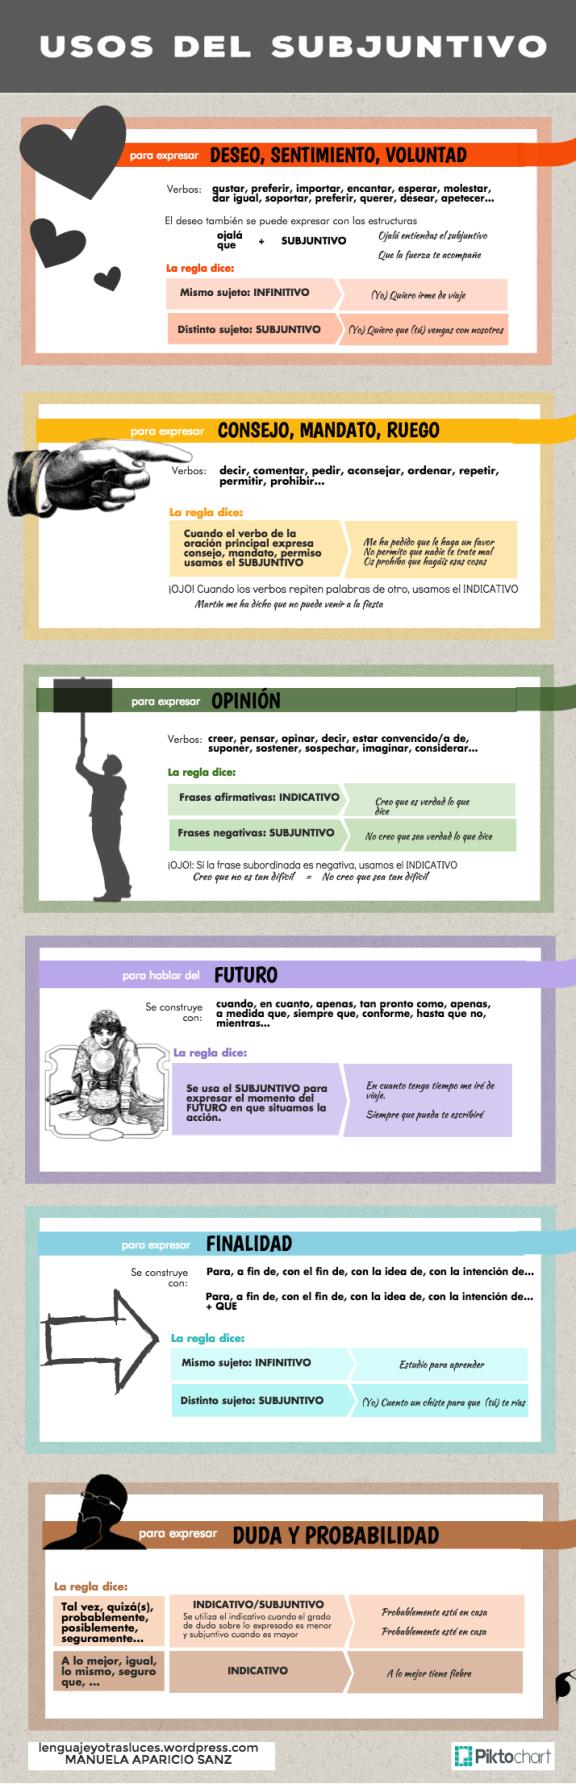 subjuntivo-uso3